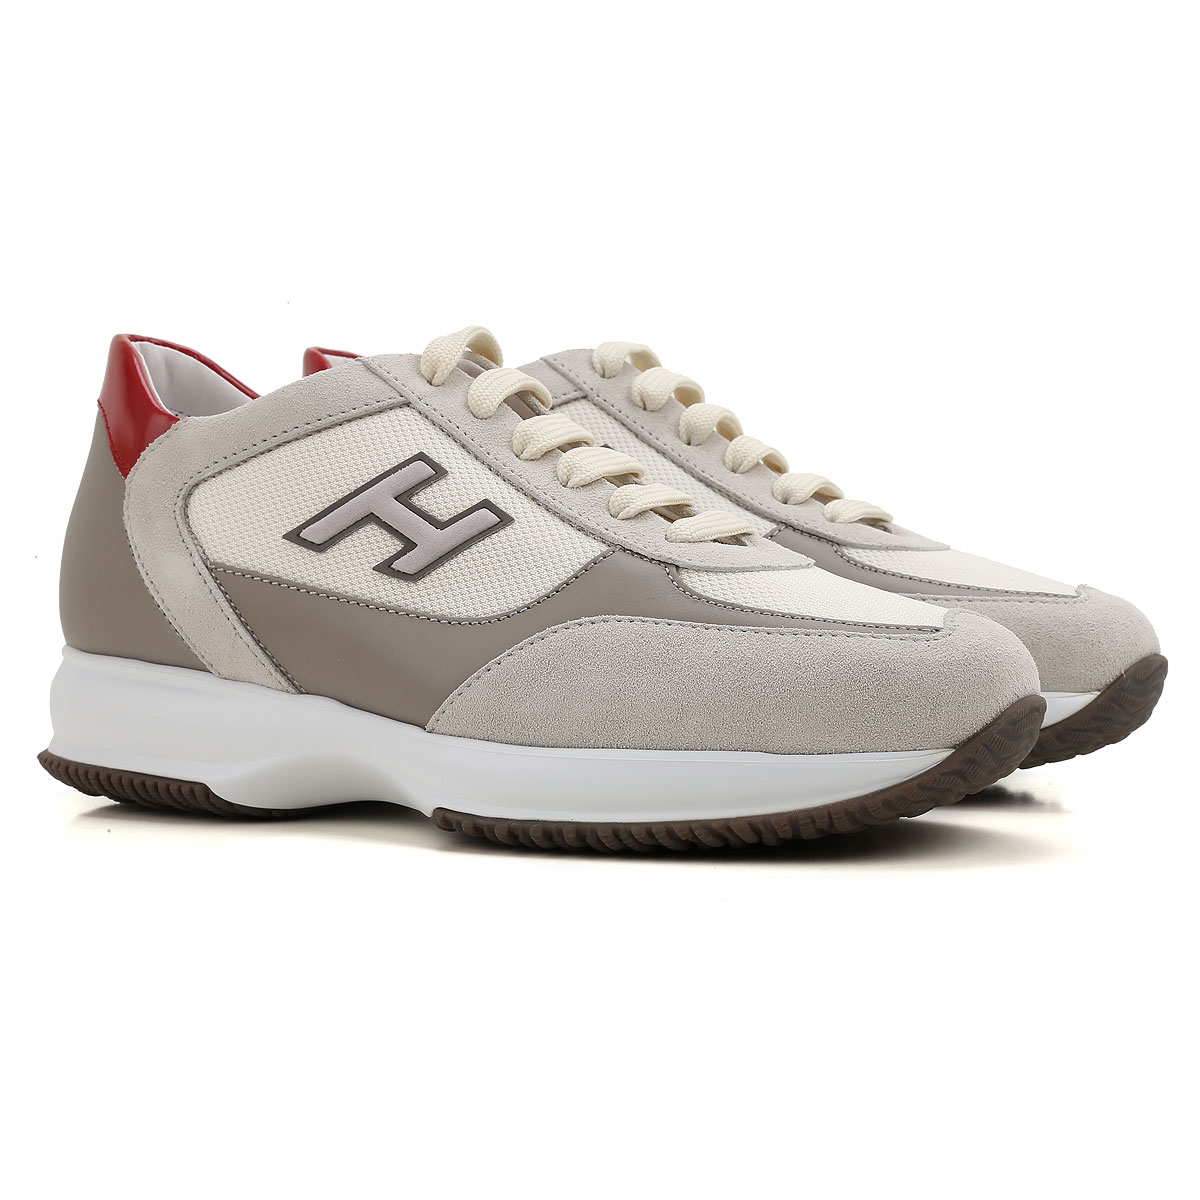 chaussures homme hogan code produit hxm00n0q102fj9637q. Black Bedroom Furniture Sets. Home Design Ideas